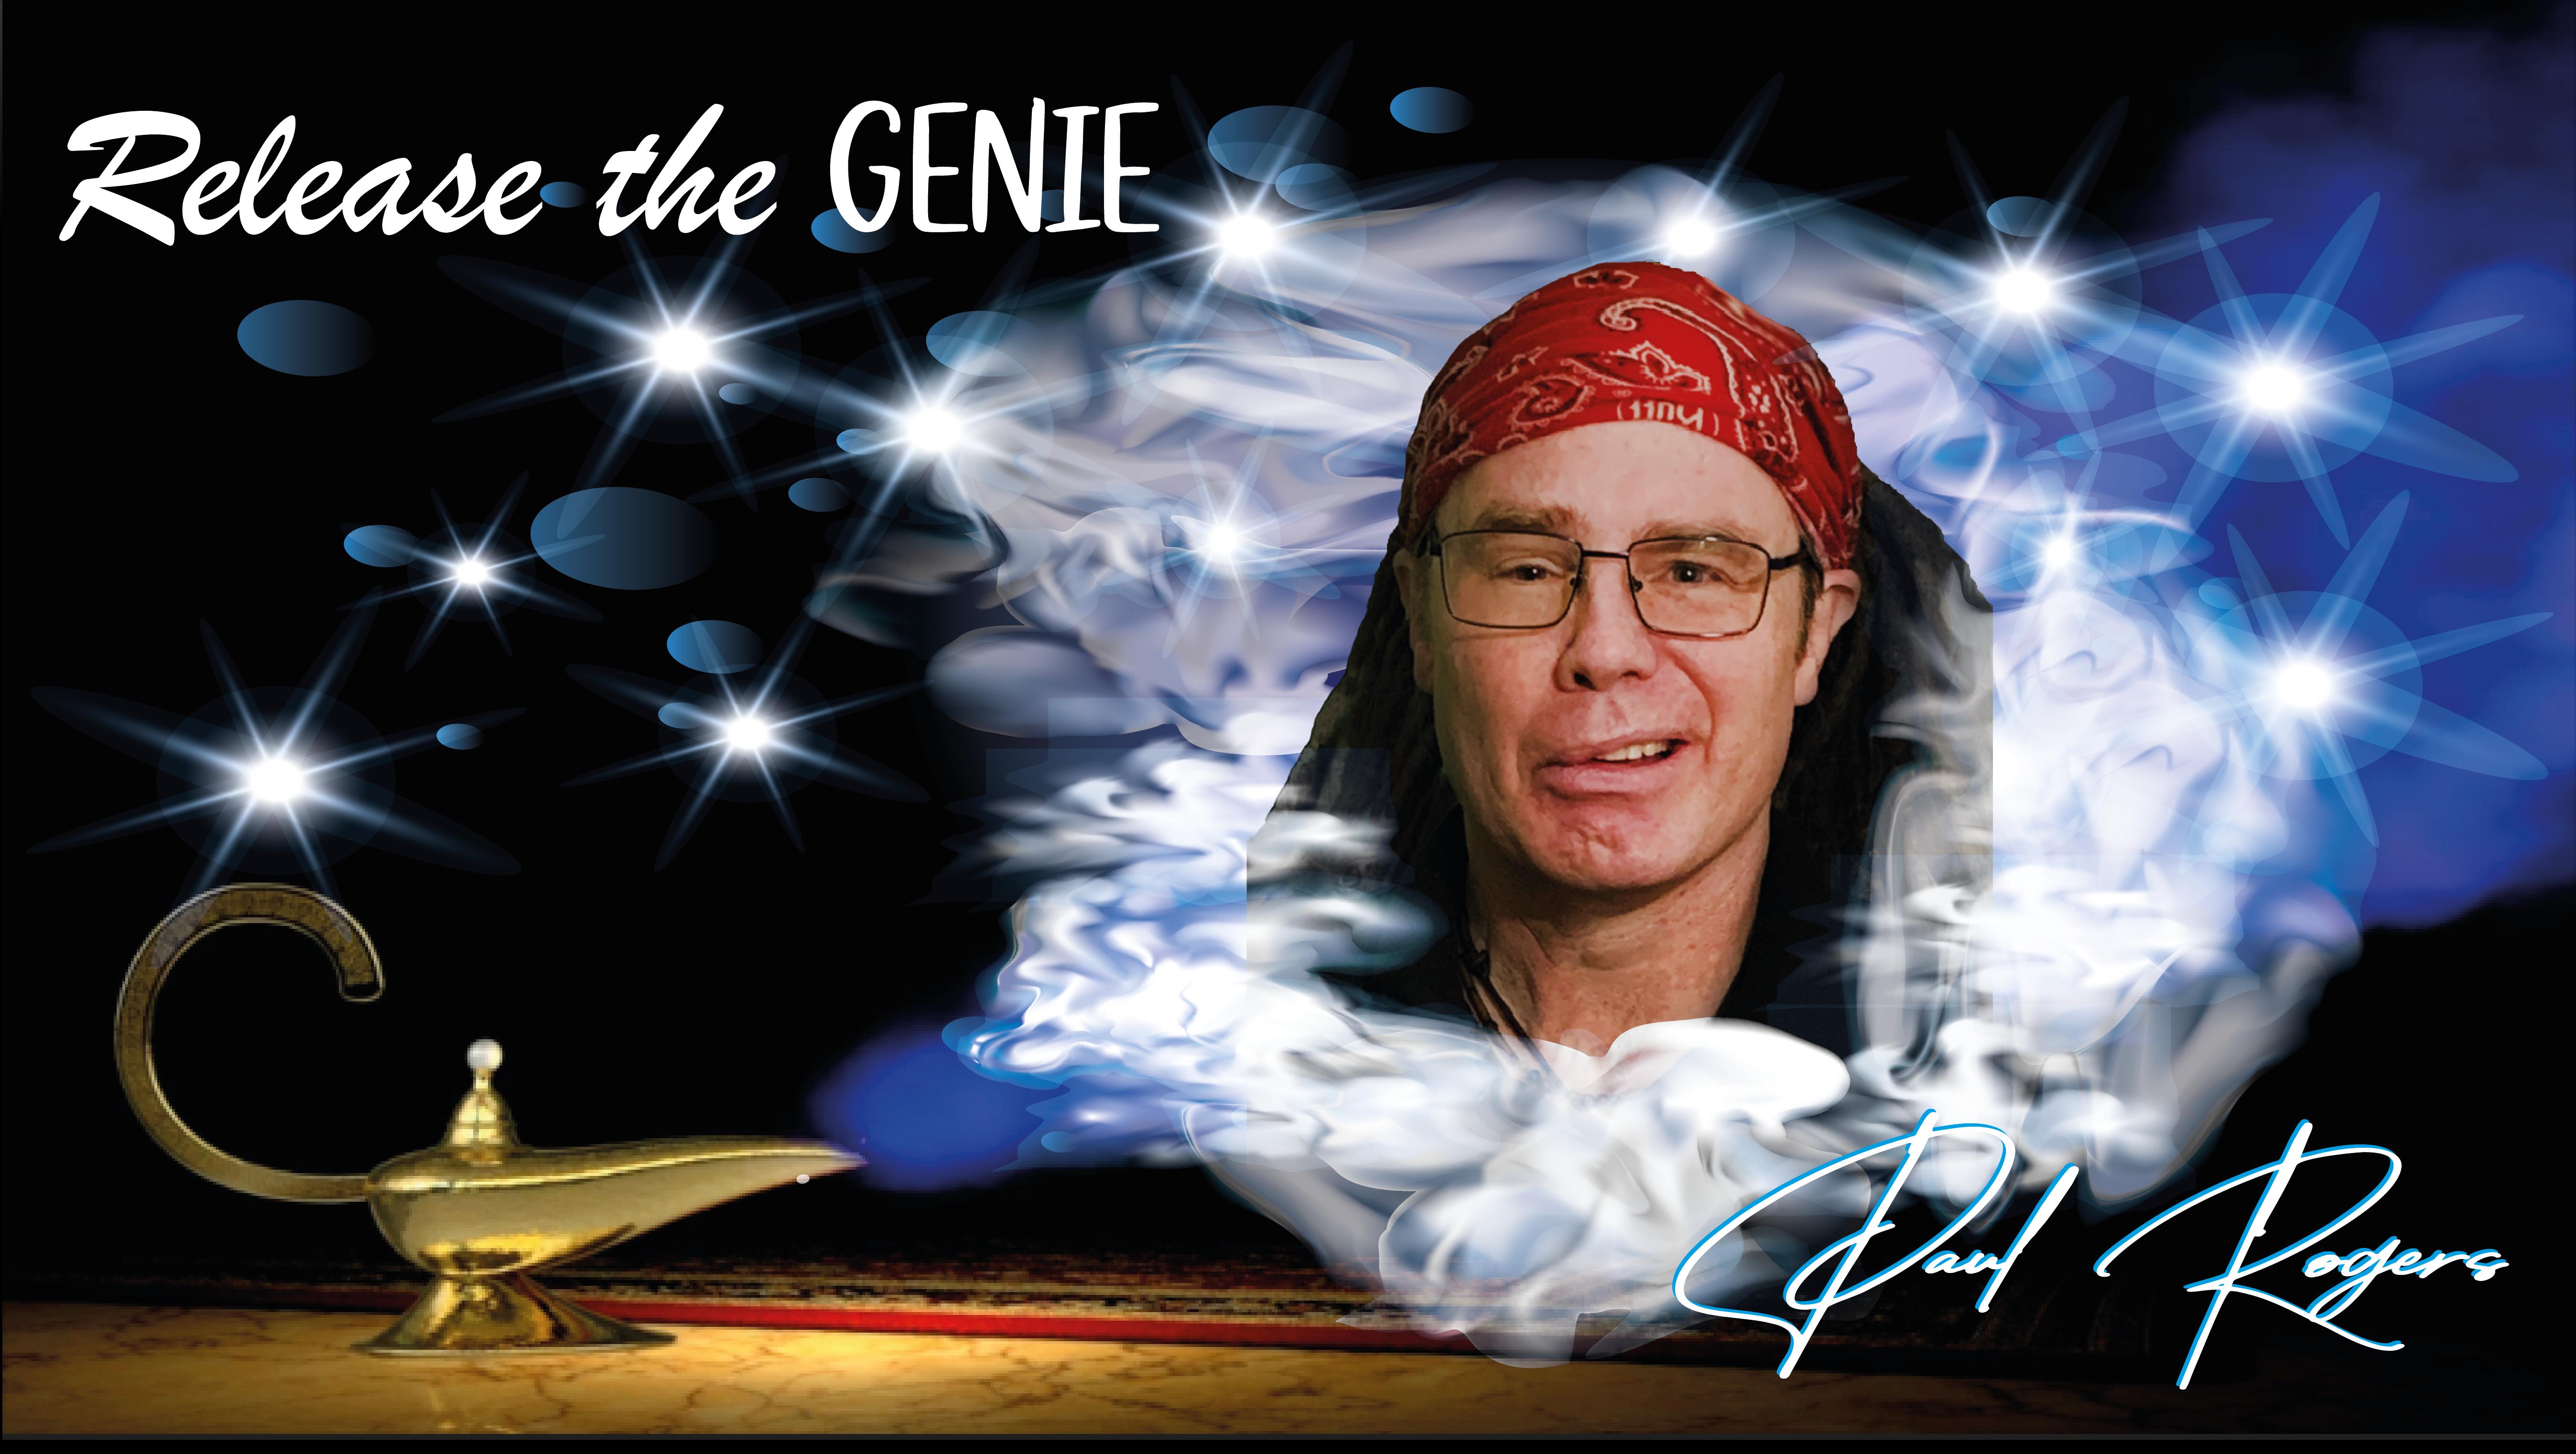 Release the Genie